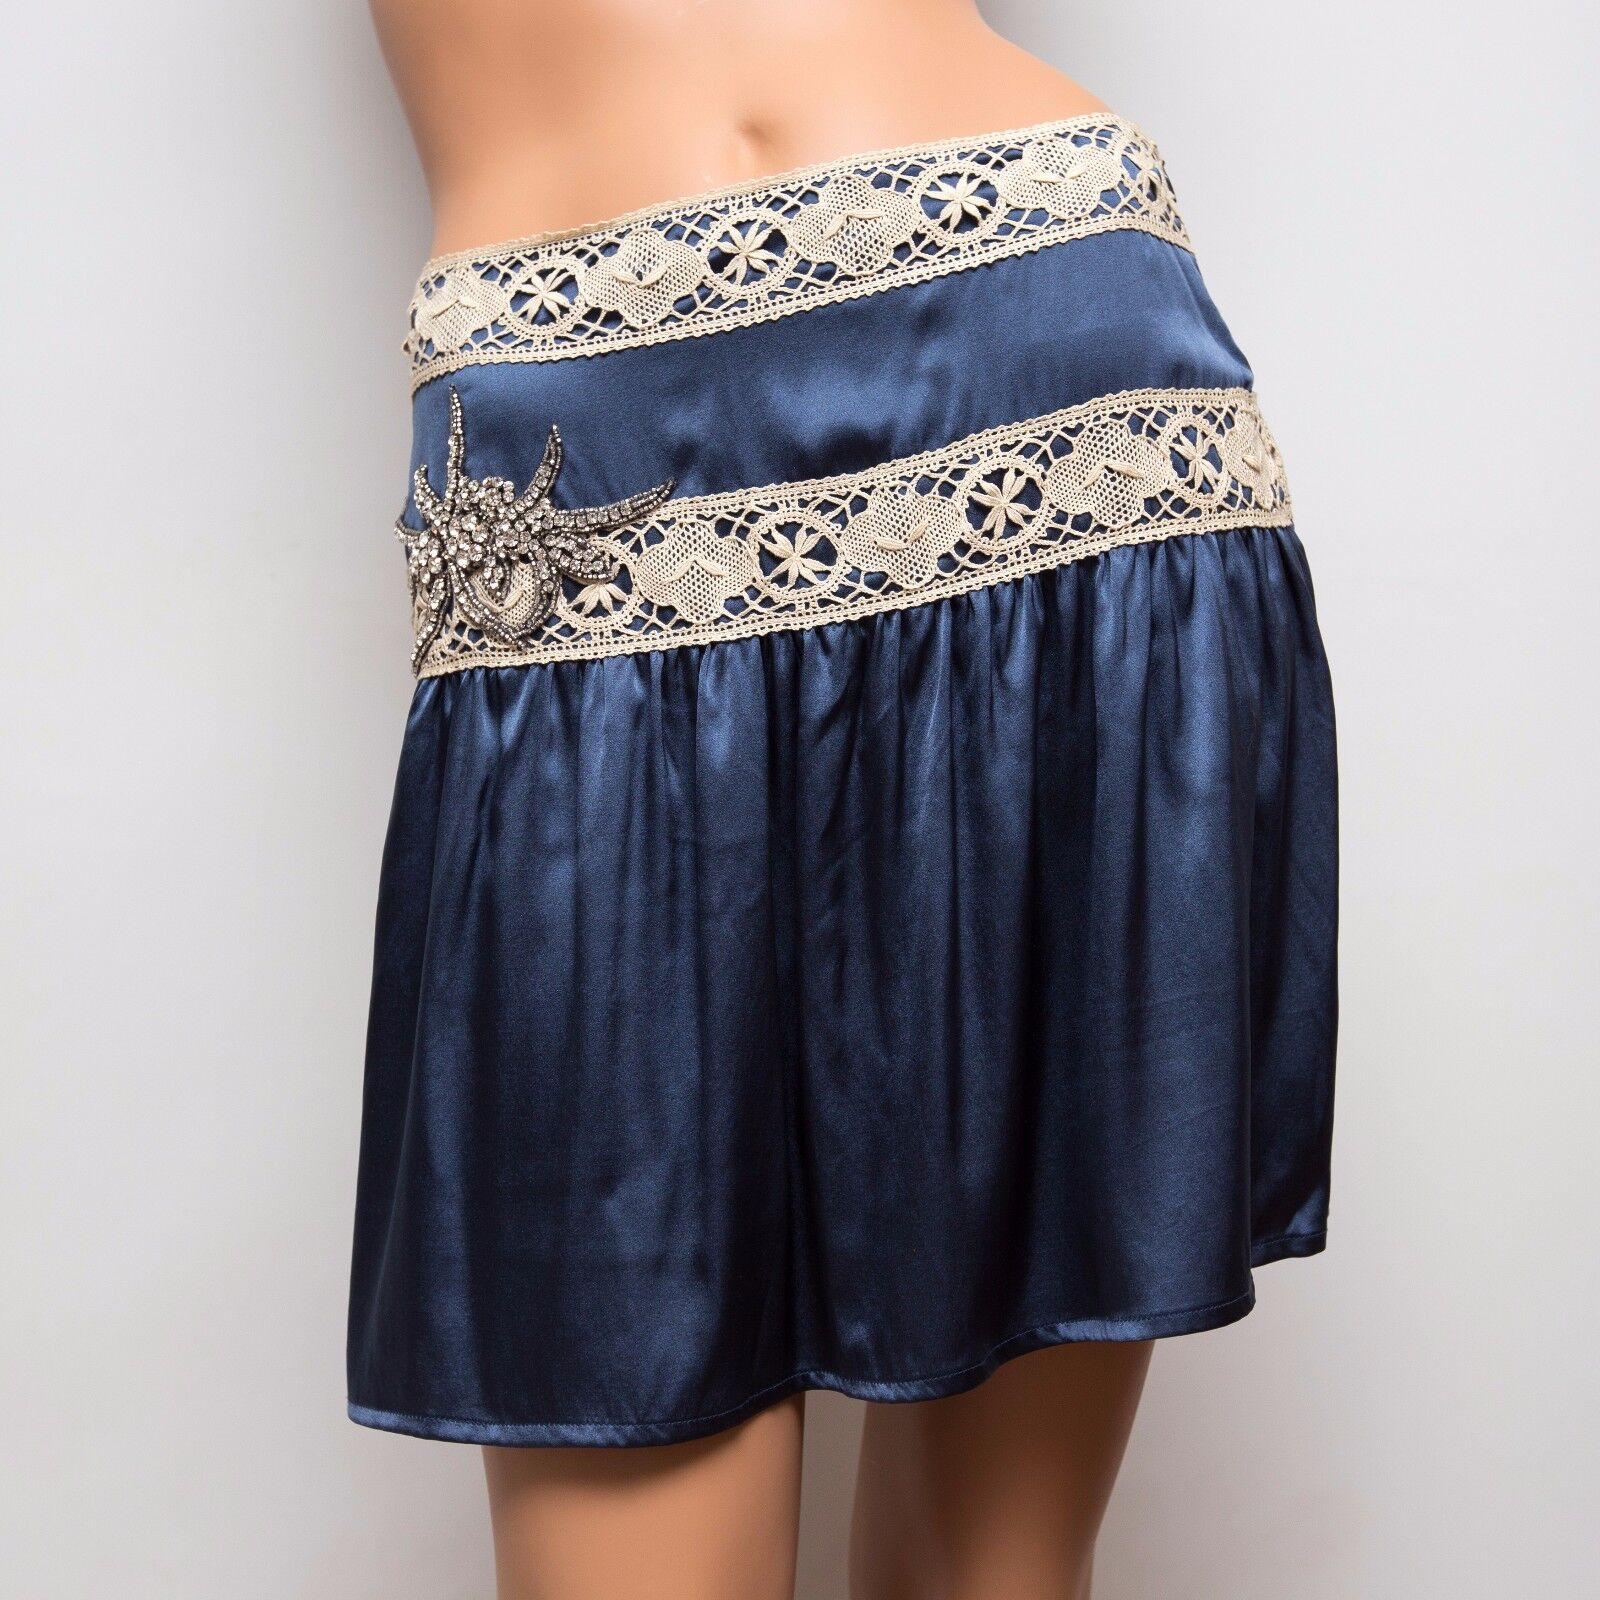 NWT Ingwa Melero 40 CS Blau Charmeuse Silk Skirt with Lace Embellishments  342